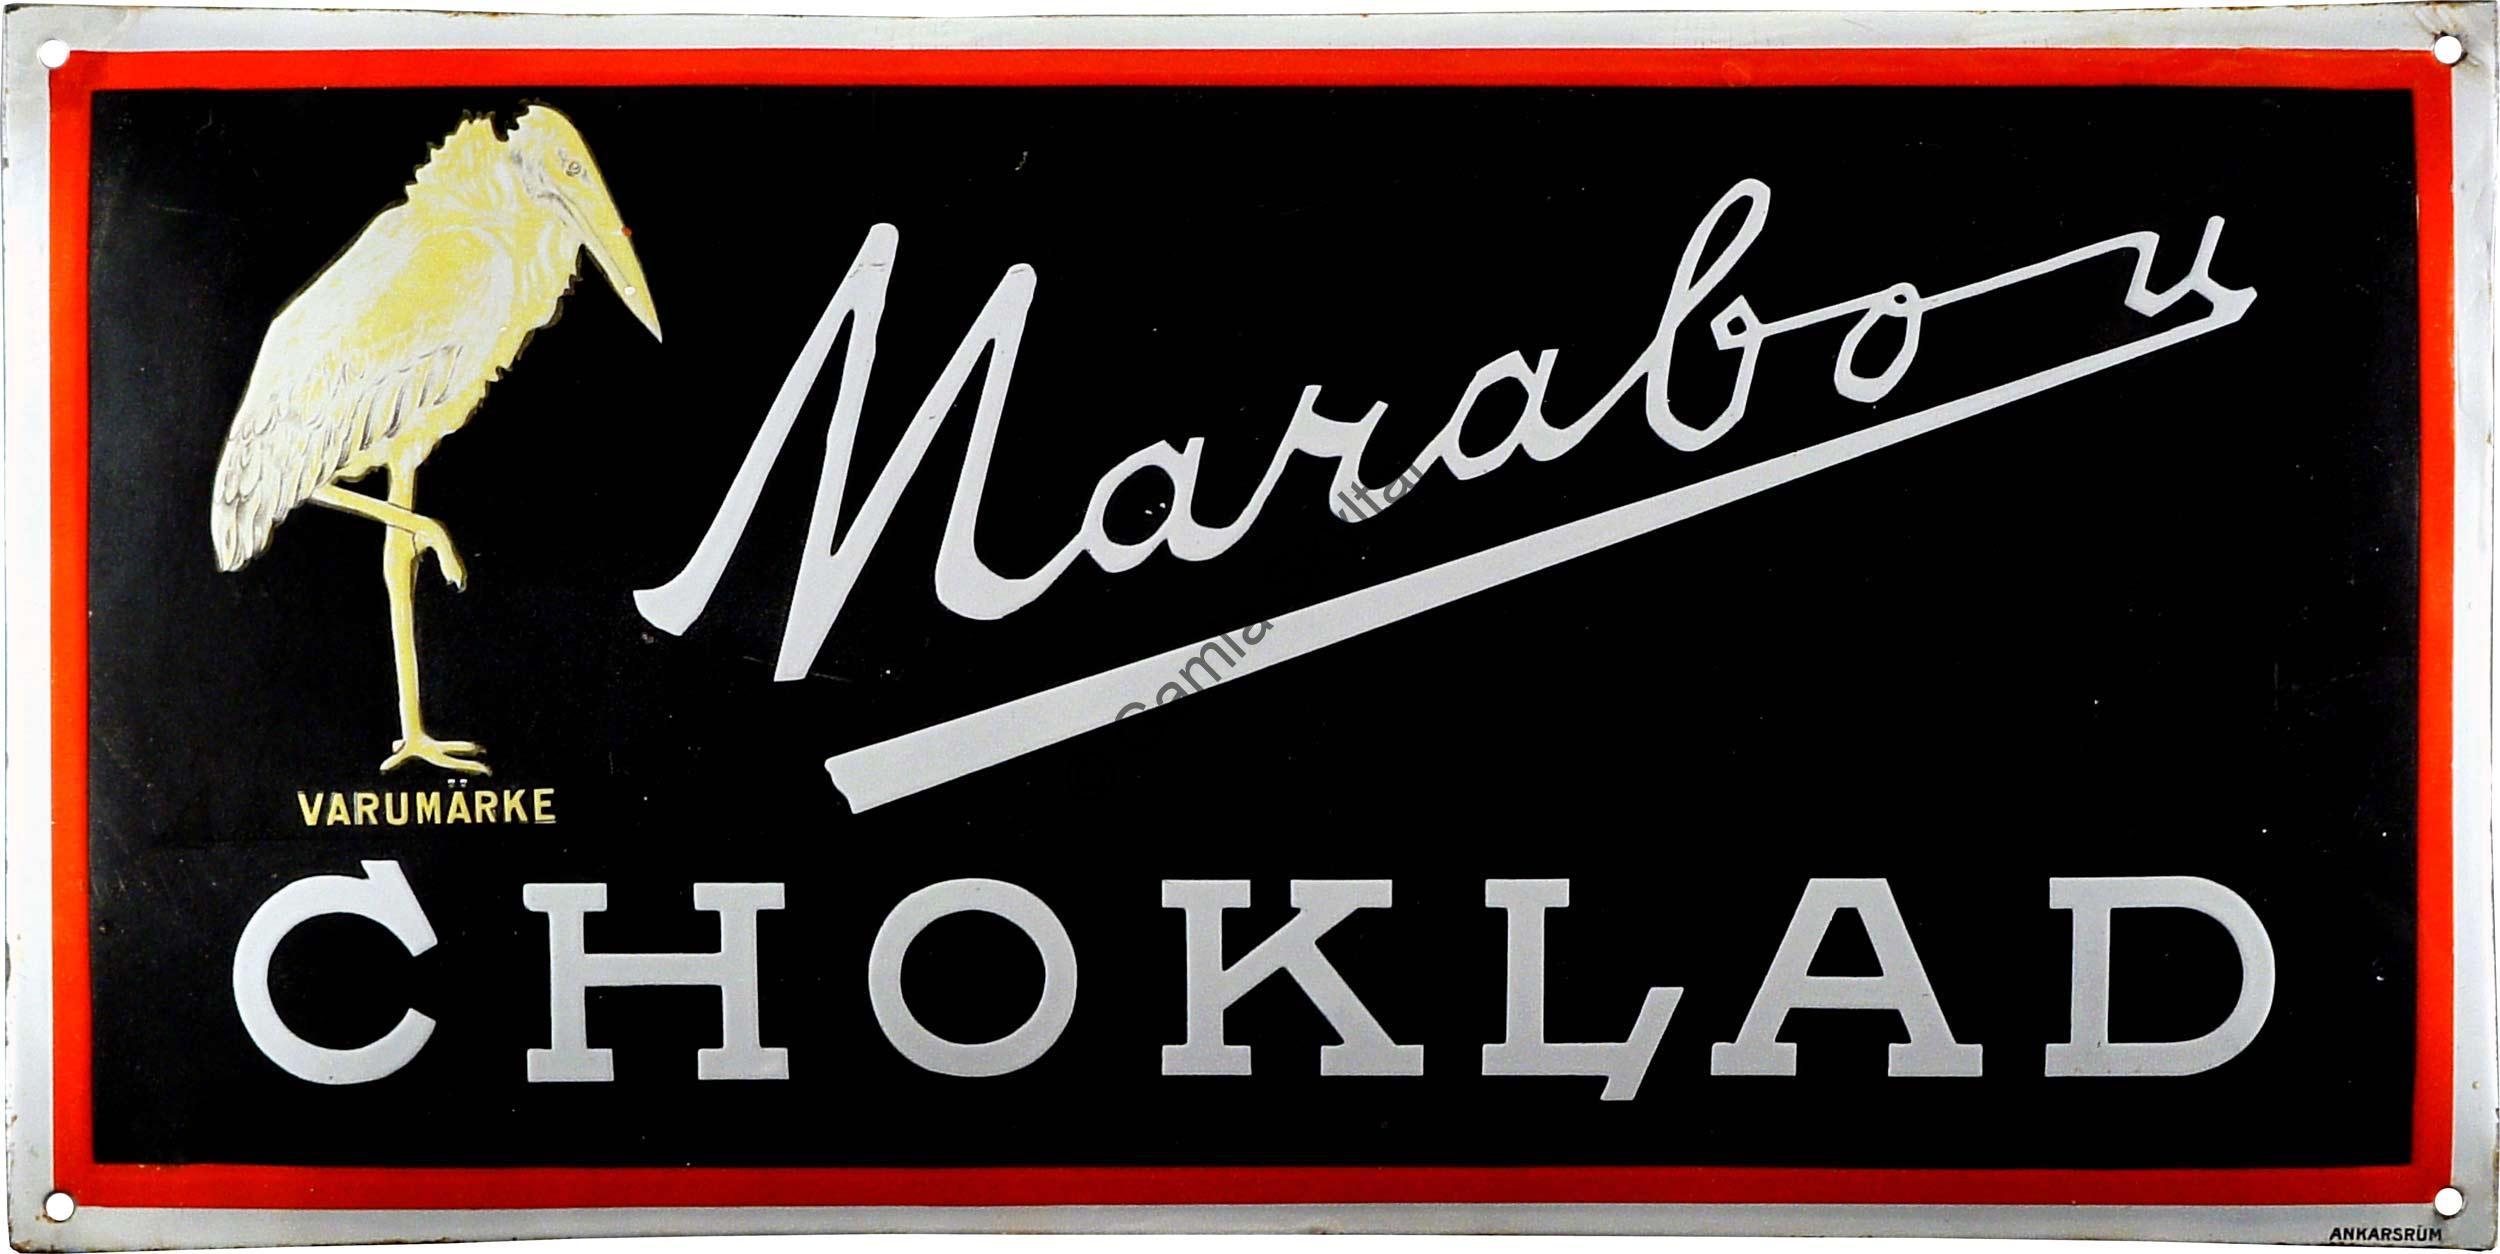 Marabou Choklad - Gamla Skyltar a4bf2322cd717